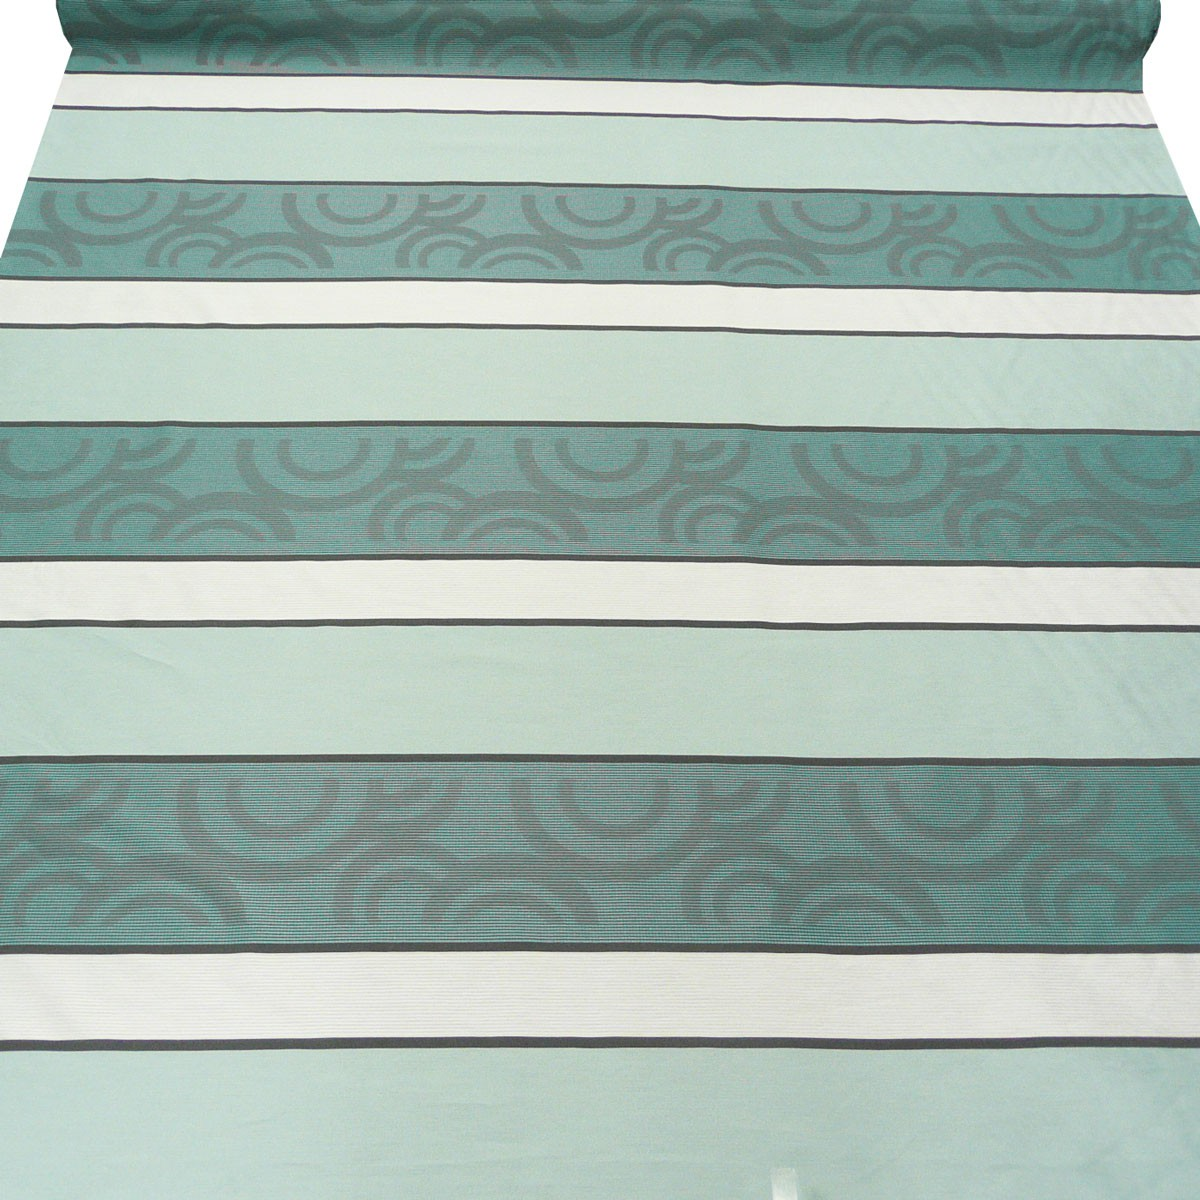 gardinenstoff meterware colorado petrol grau creme 1 50m. Black Bedroom Furniture Sets. Home Design Ideas